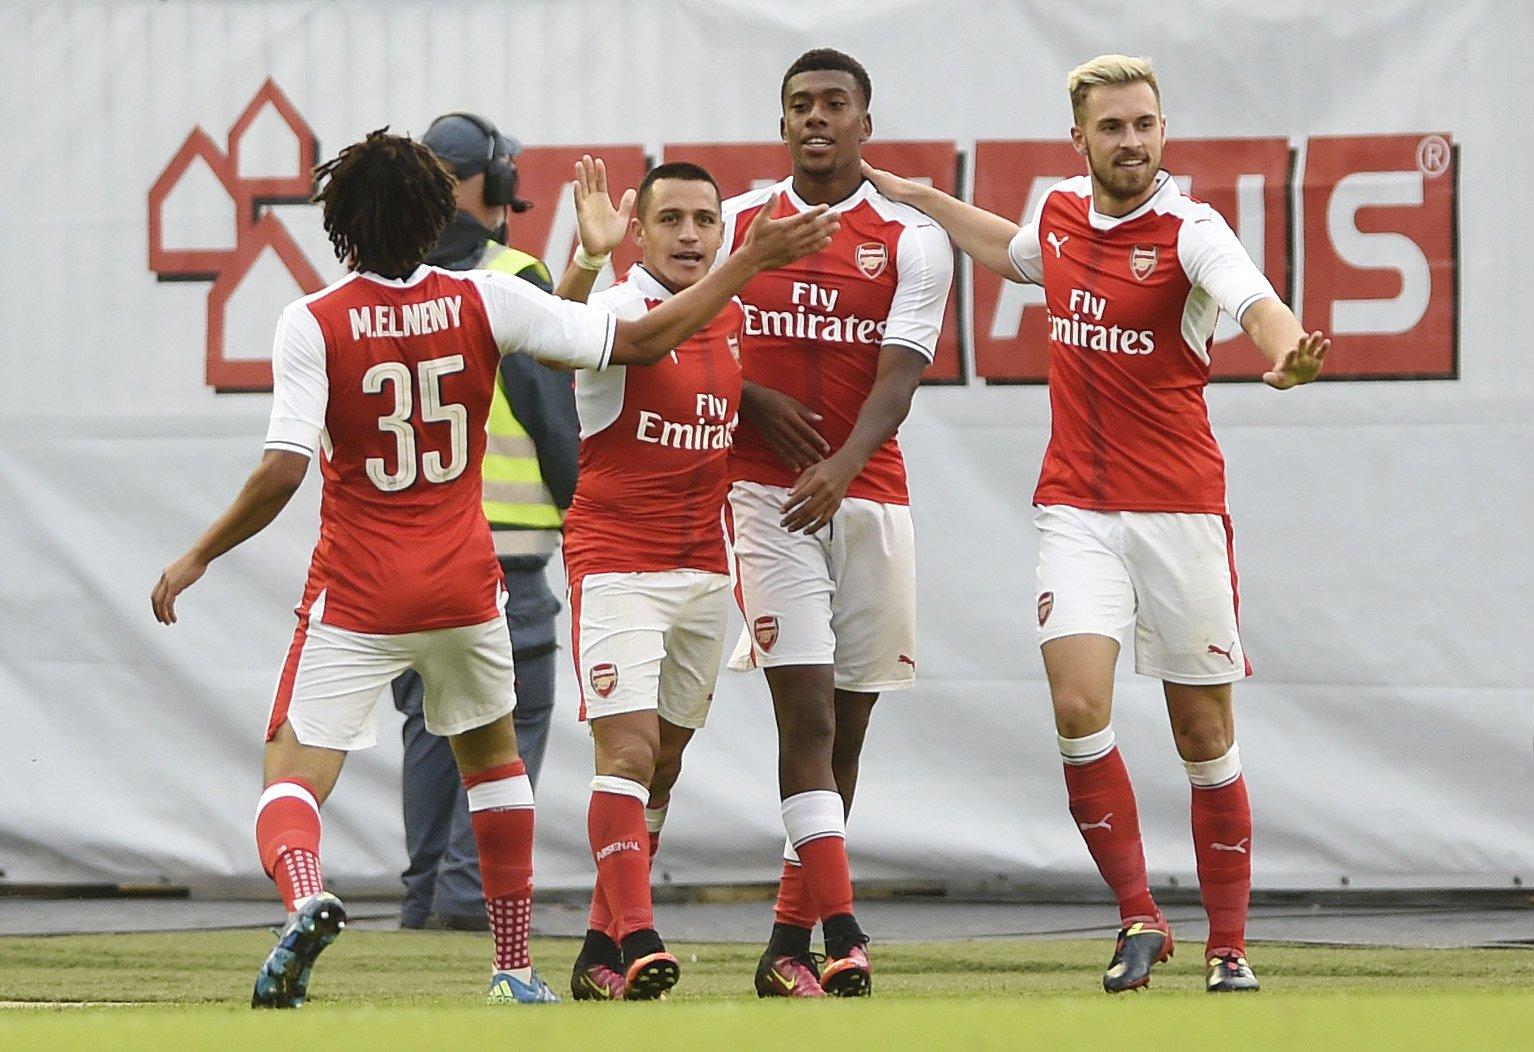 Iwobi, Akpom, Iheanacho On Target As Arsenal Edge Man City